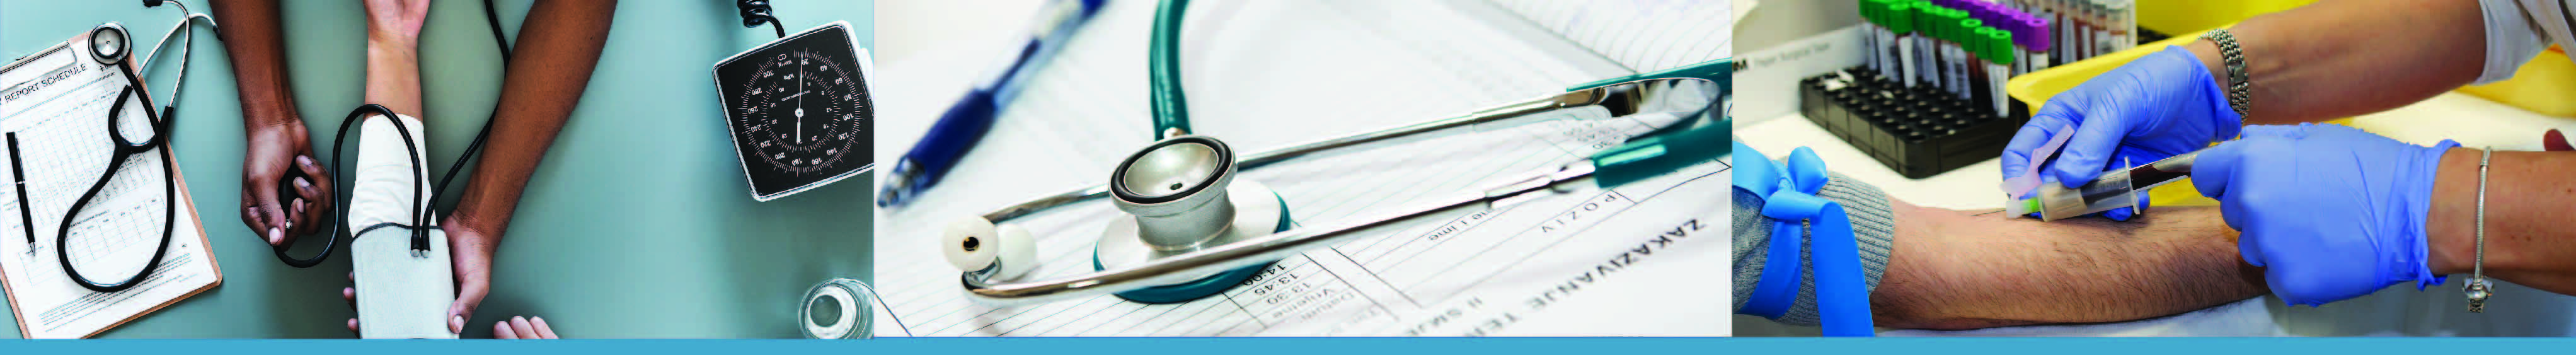 Header - Enfermería-01